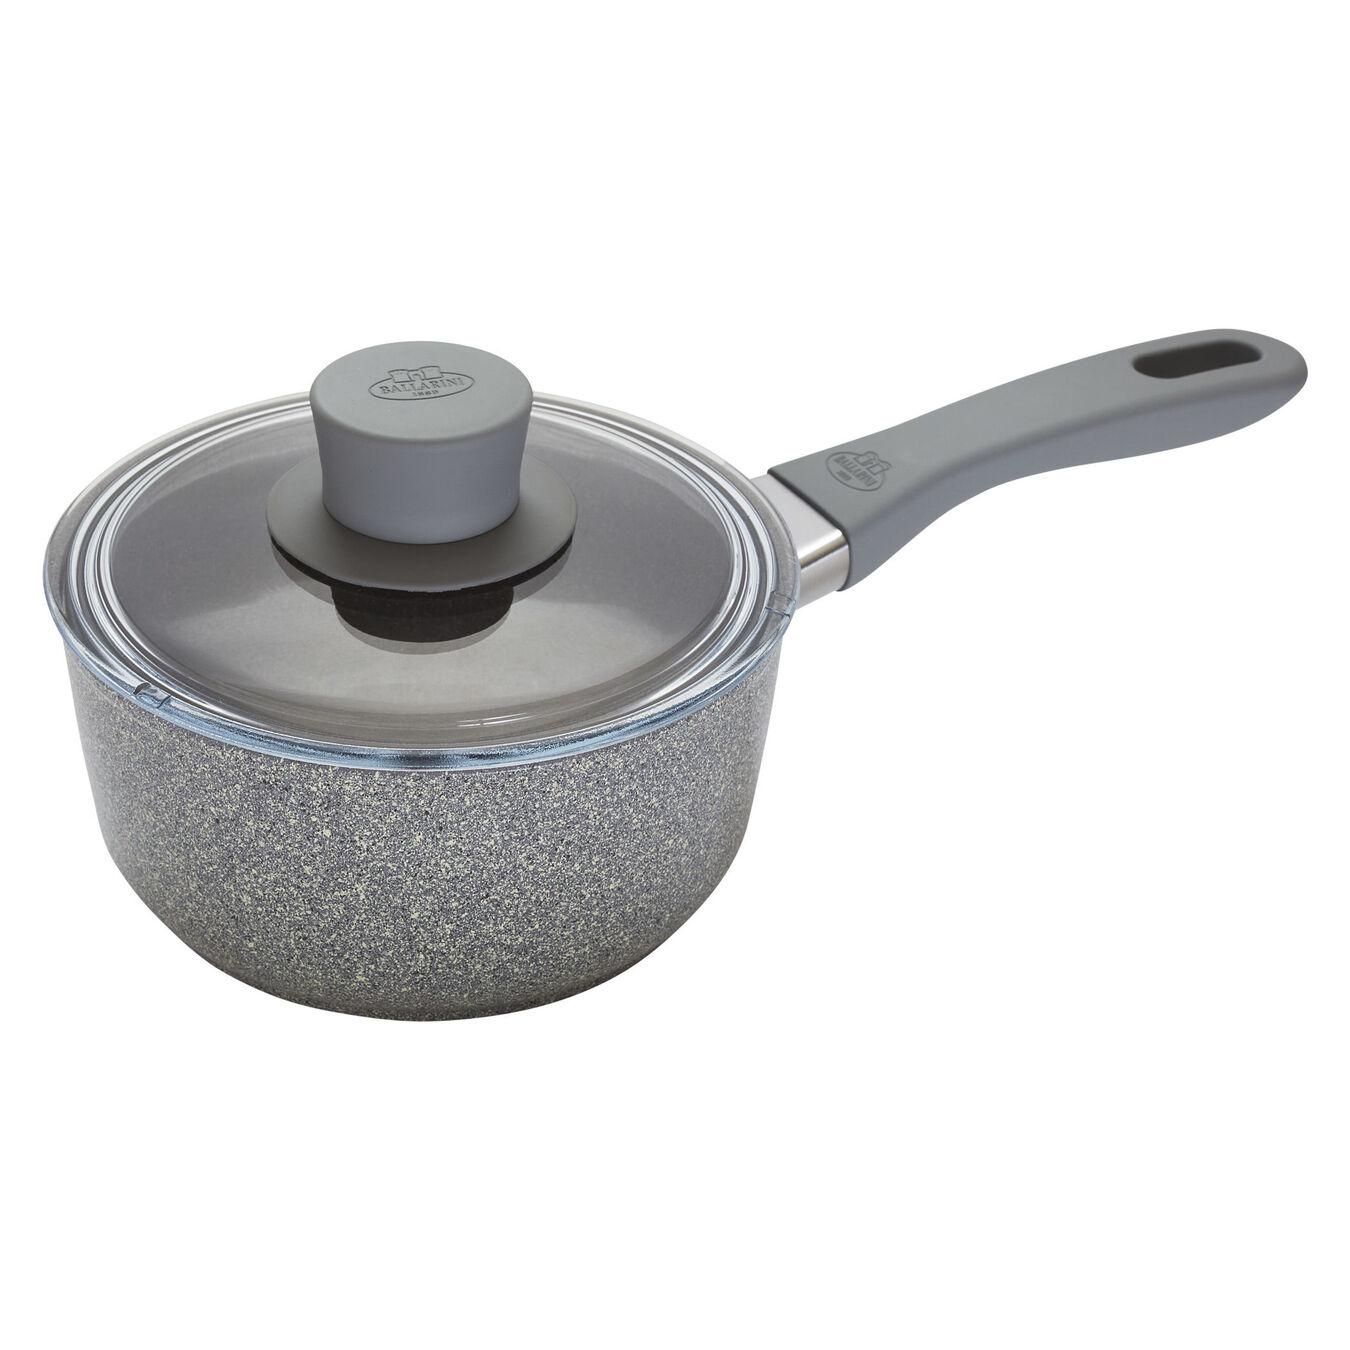 10-pc, Aluminum Nonstick Cookware Set,,large 4